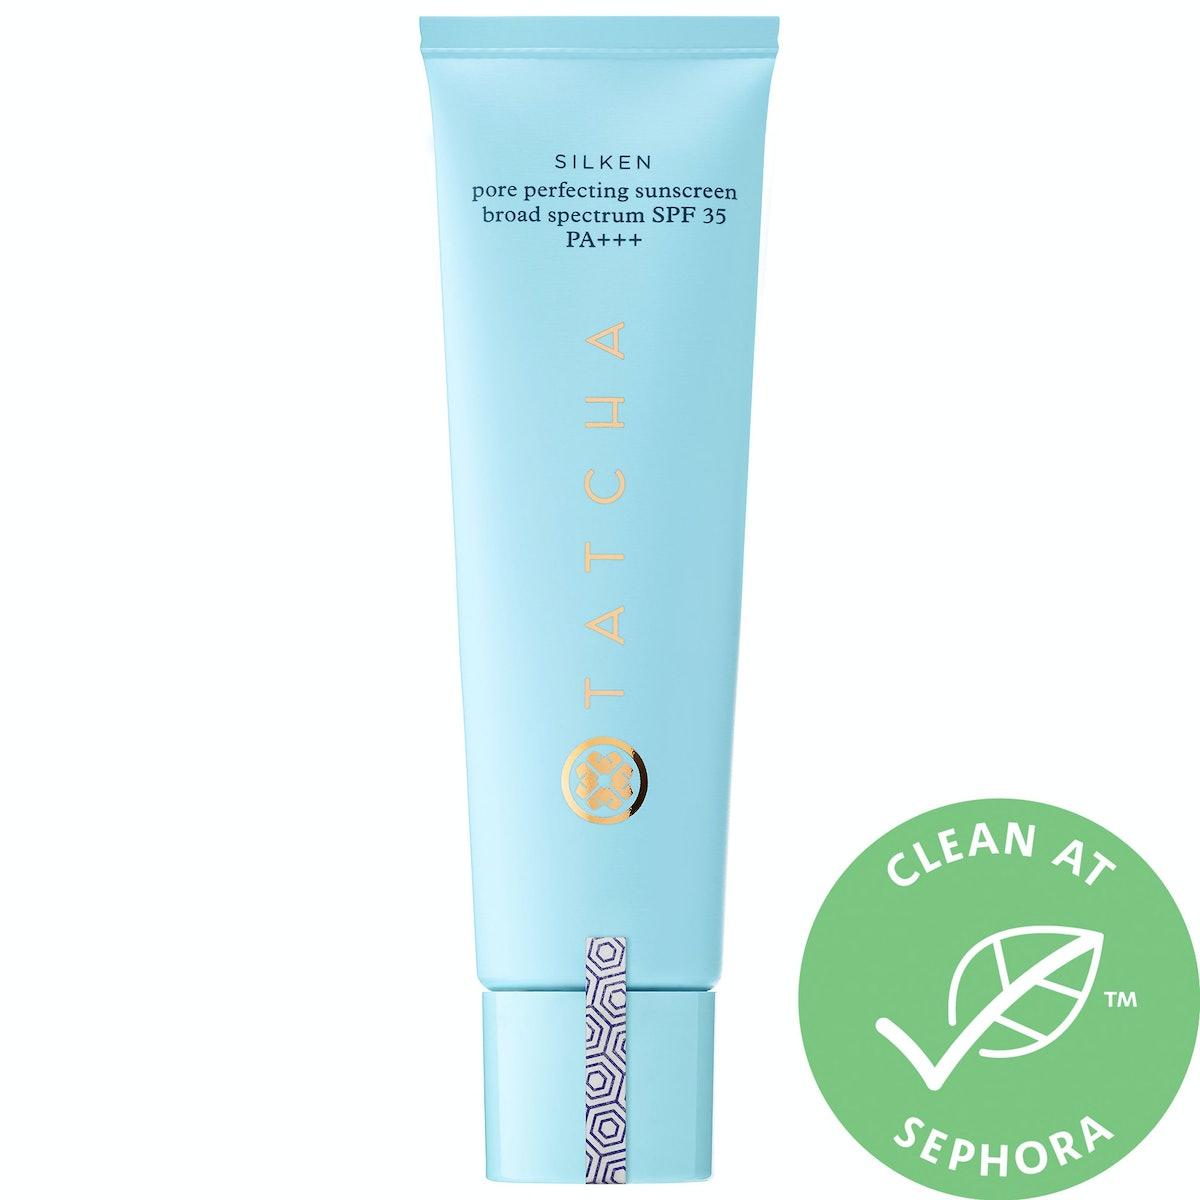 Silken Pore Perfecting Sunscreen Broad Spectrum, SPF 35 PA+++